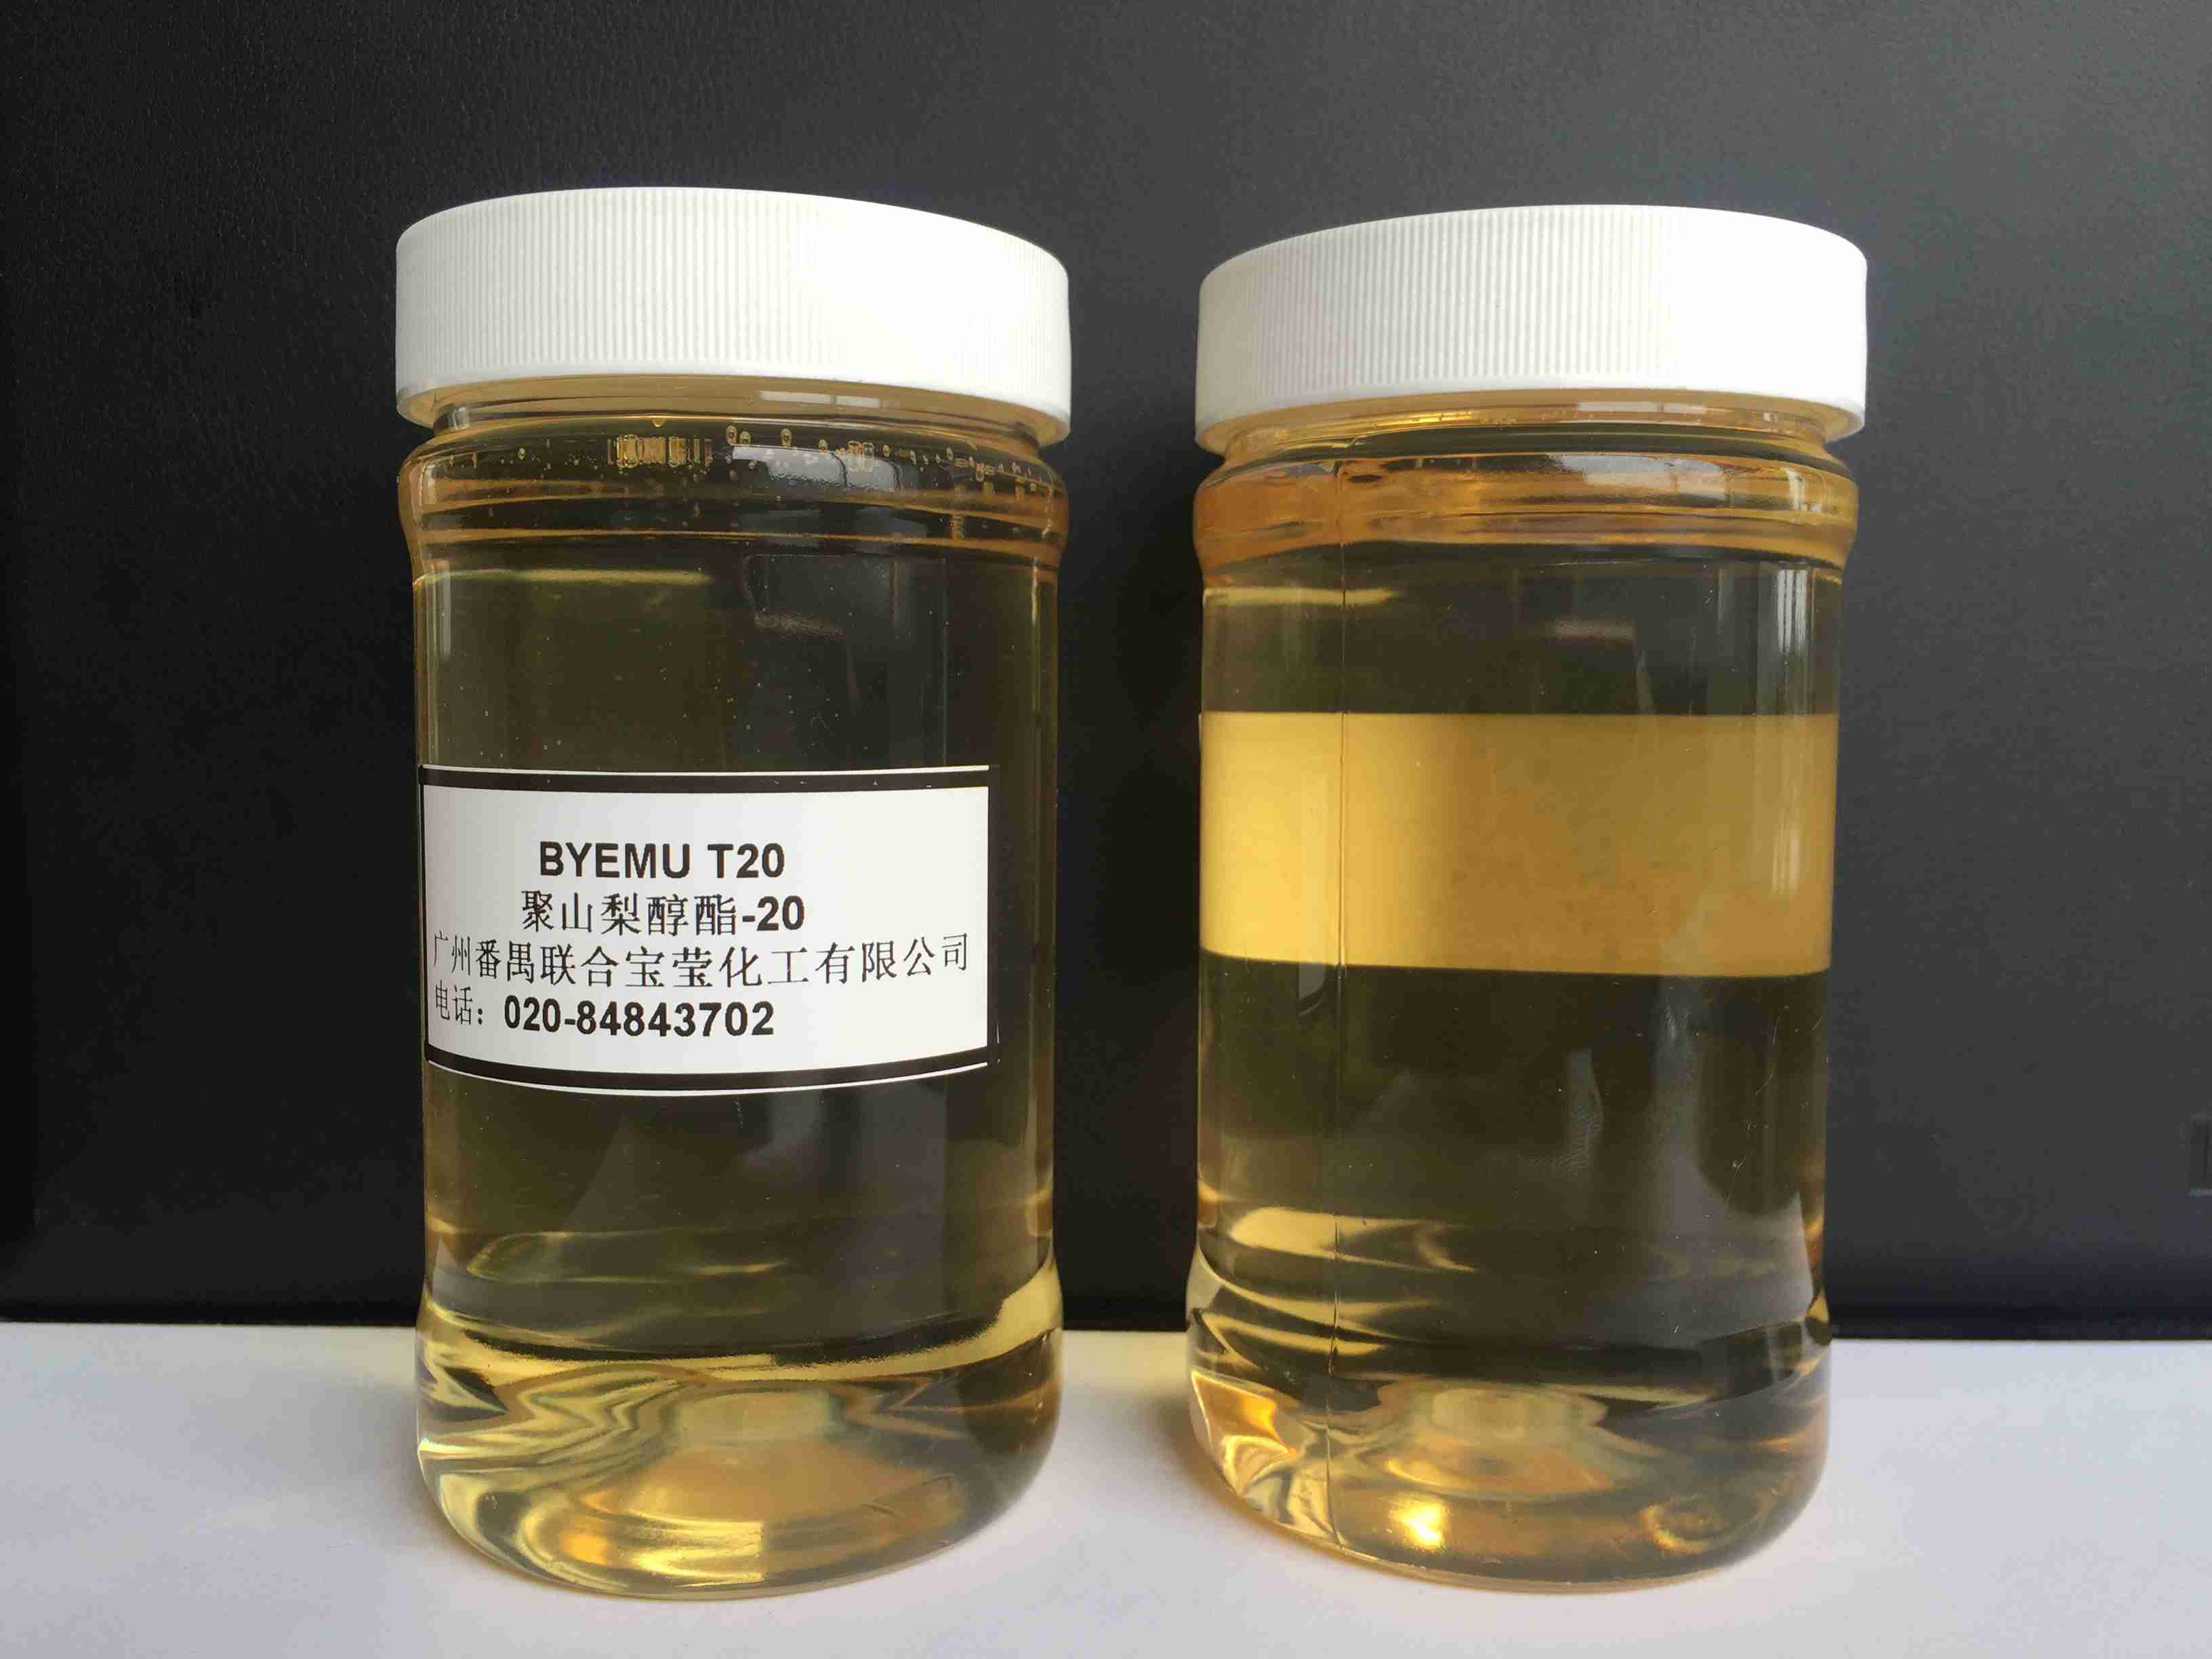 BYEMU T20聚山梨醇酯-20